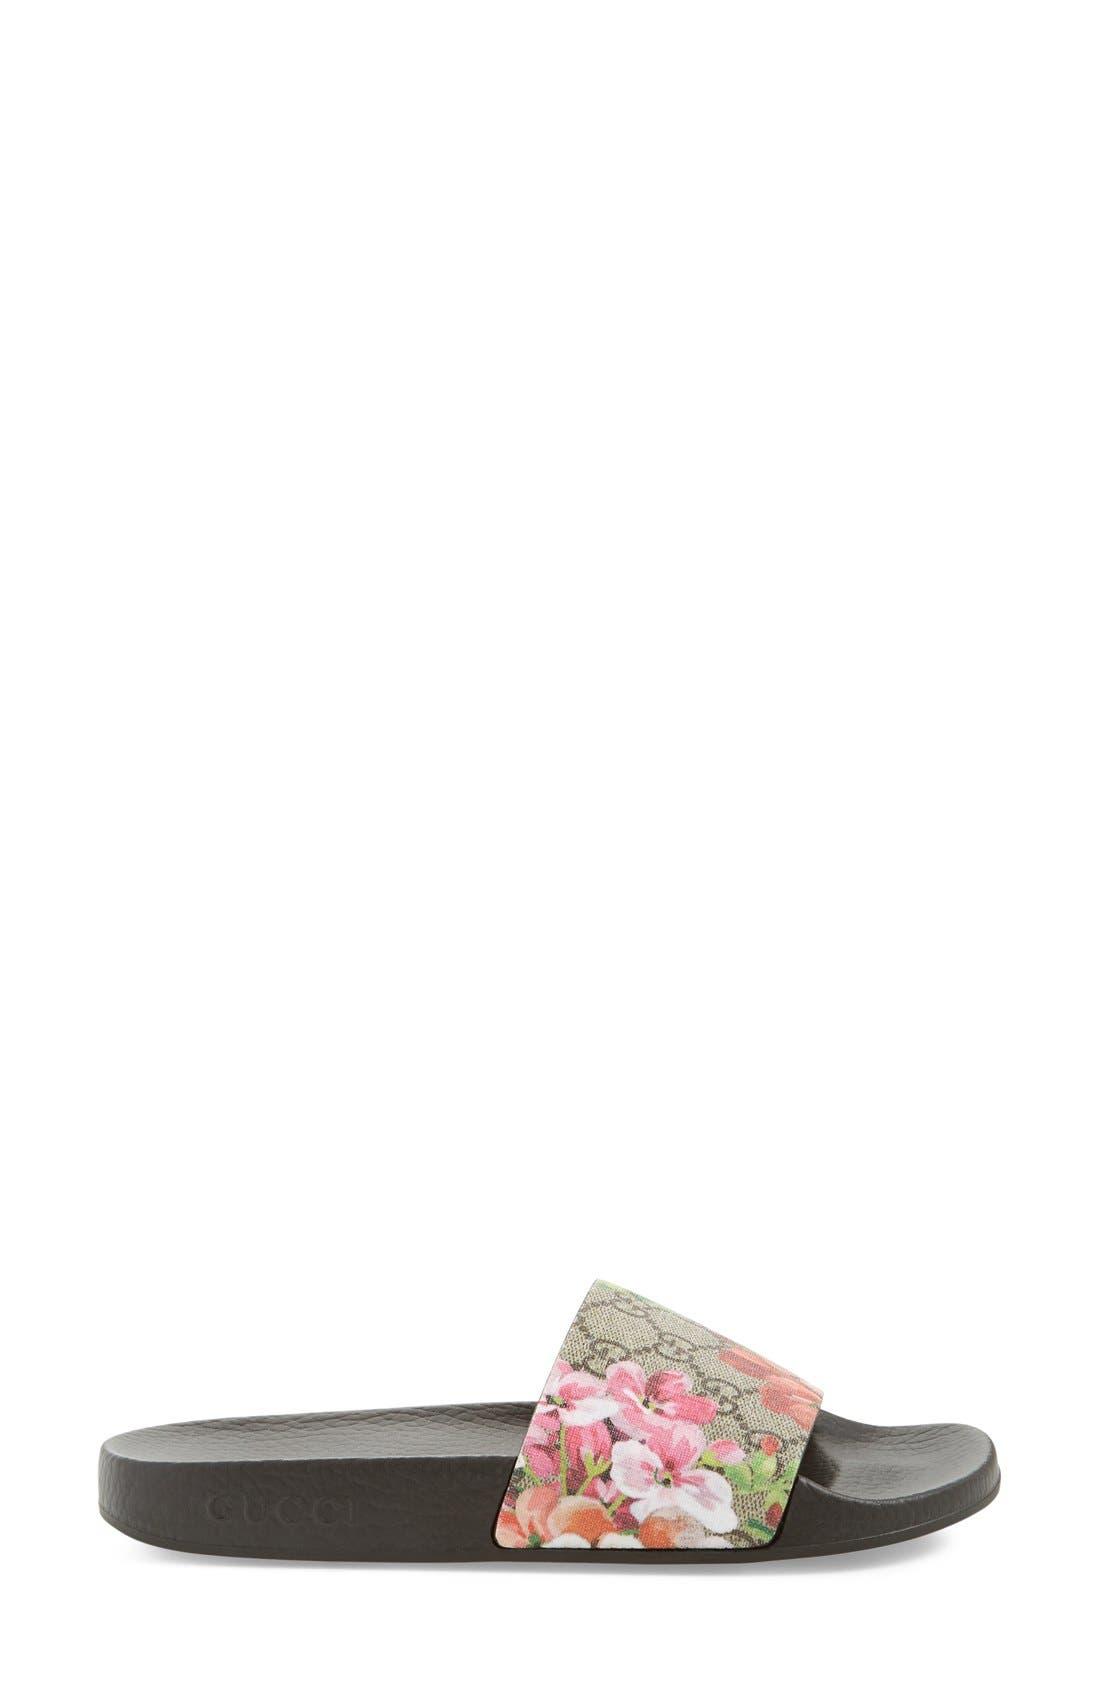 Slide Sandal,                             Alternate thumbnail 3, color,                             MULTI COLOR FABRIC